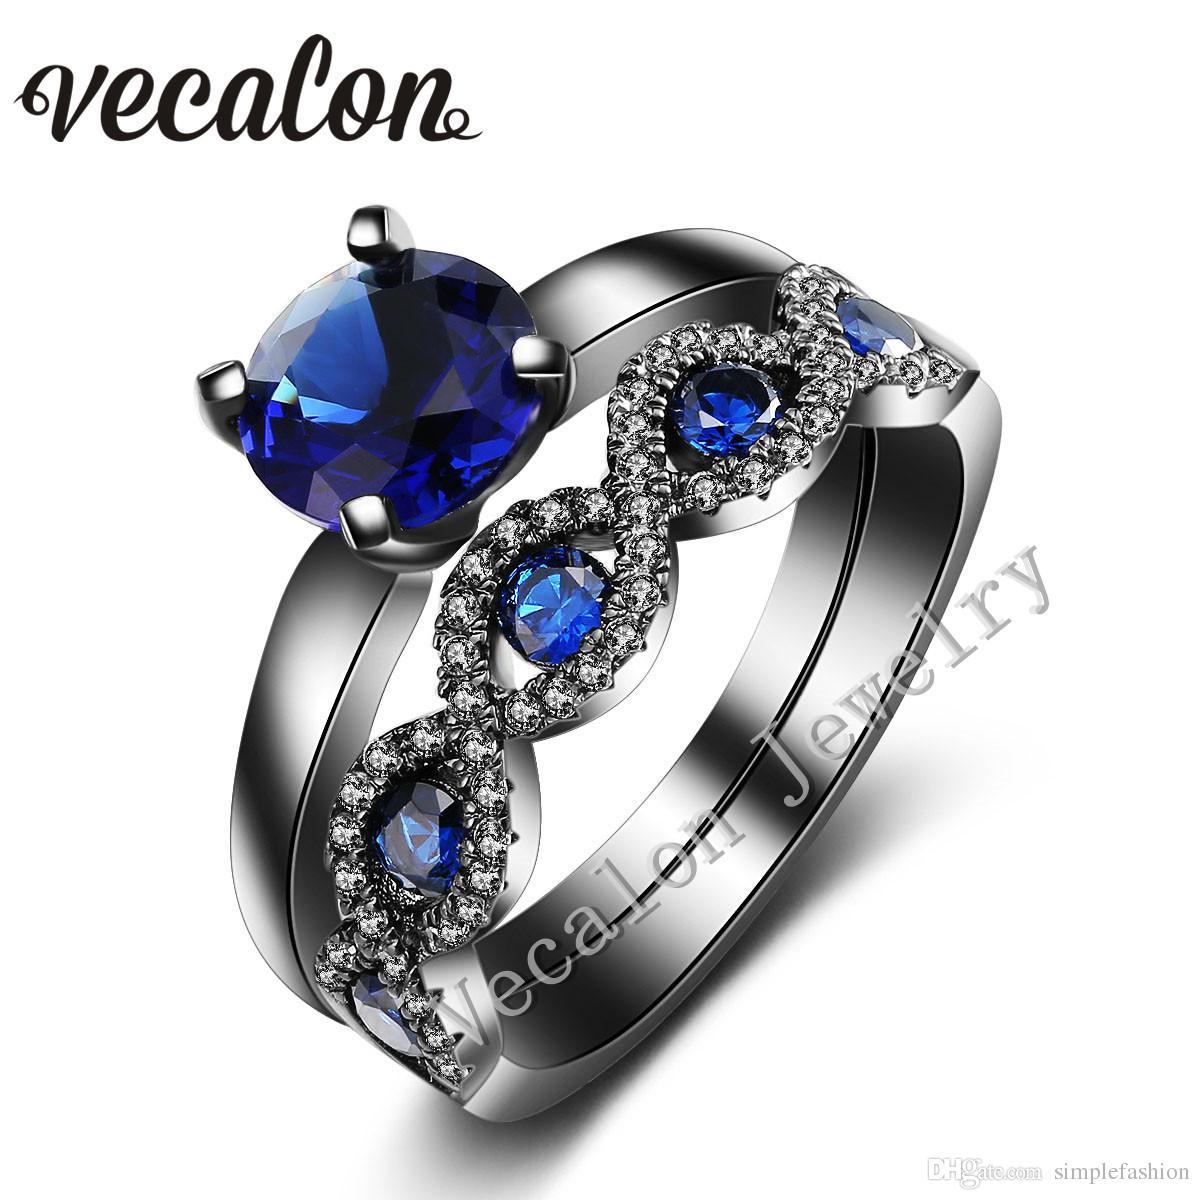 2019 Vecalon Cross Women Wedding Band Ring Set 2ct Blue Sapphire